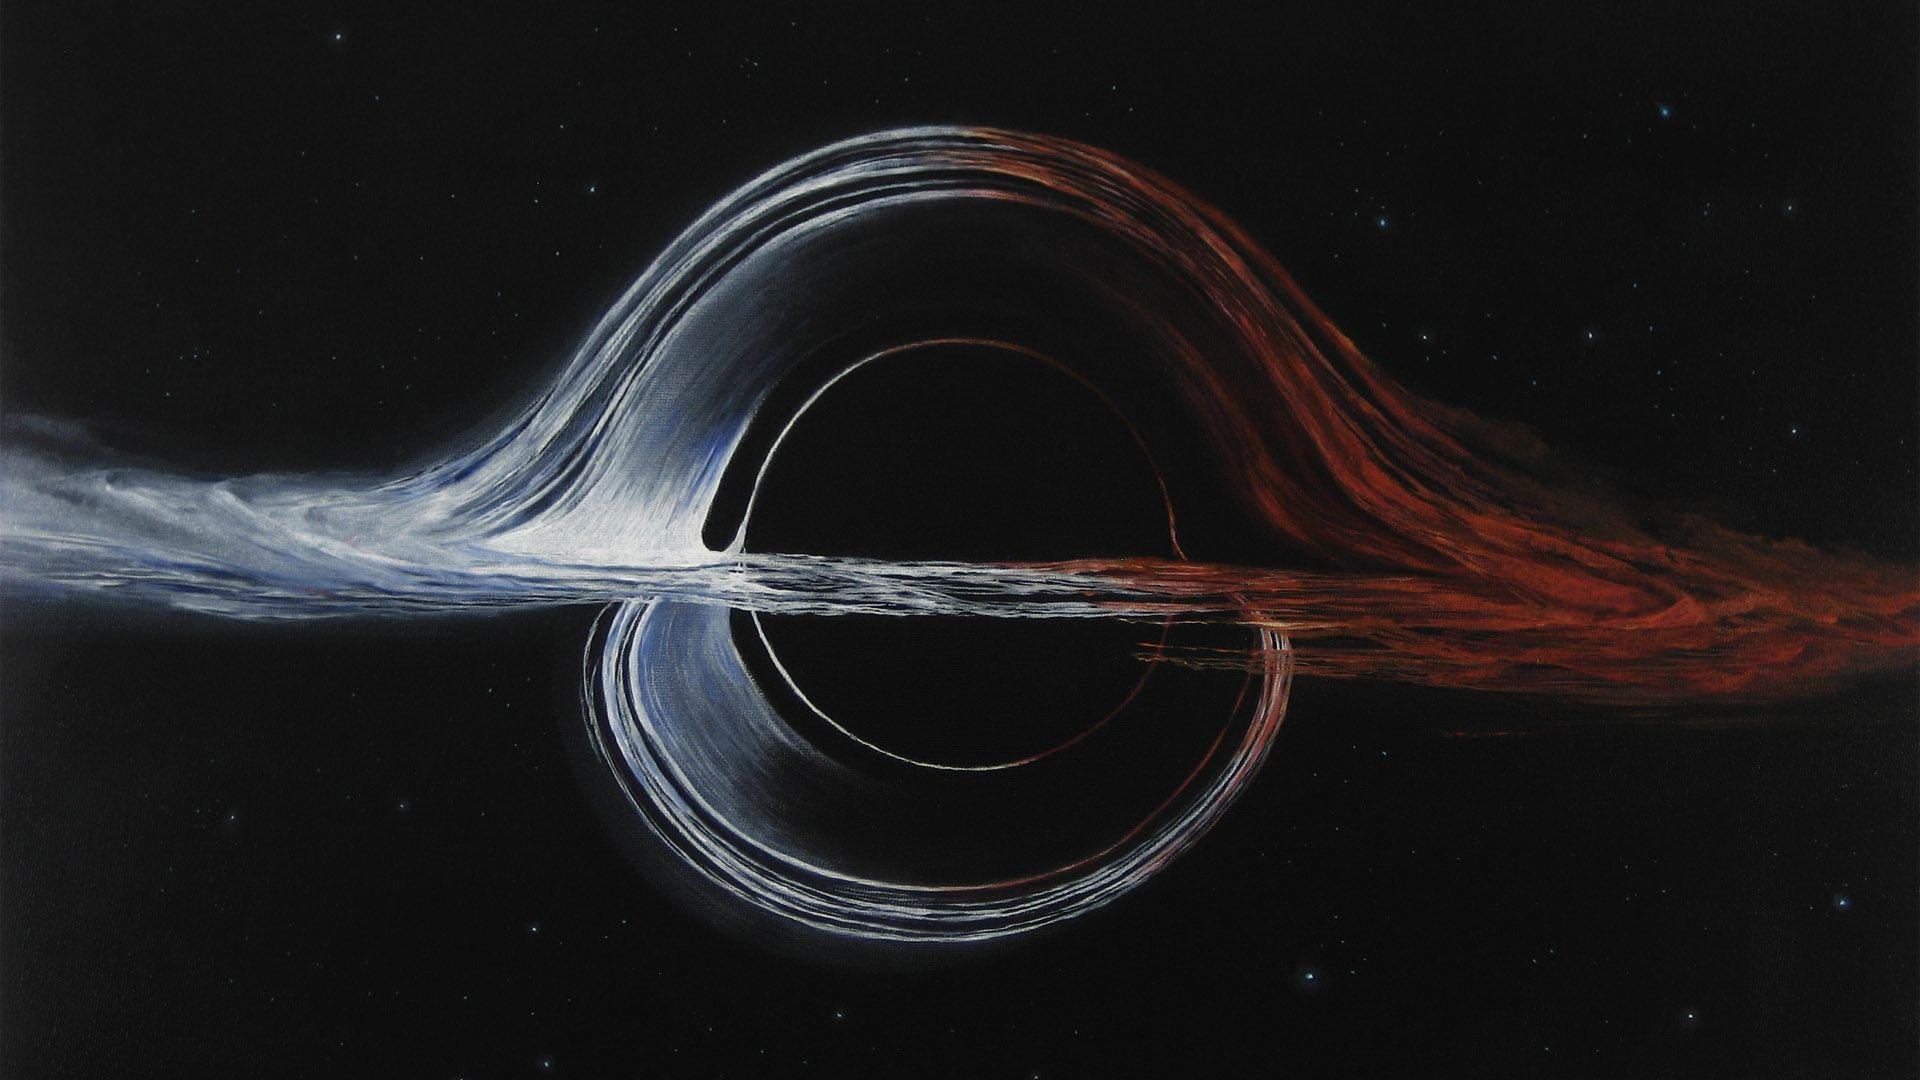 Black Hole Interstellar, Wallpaper Image